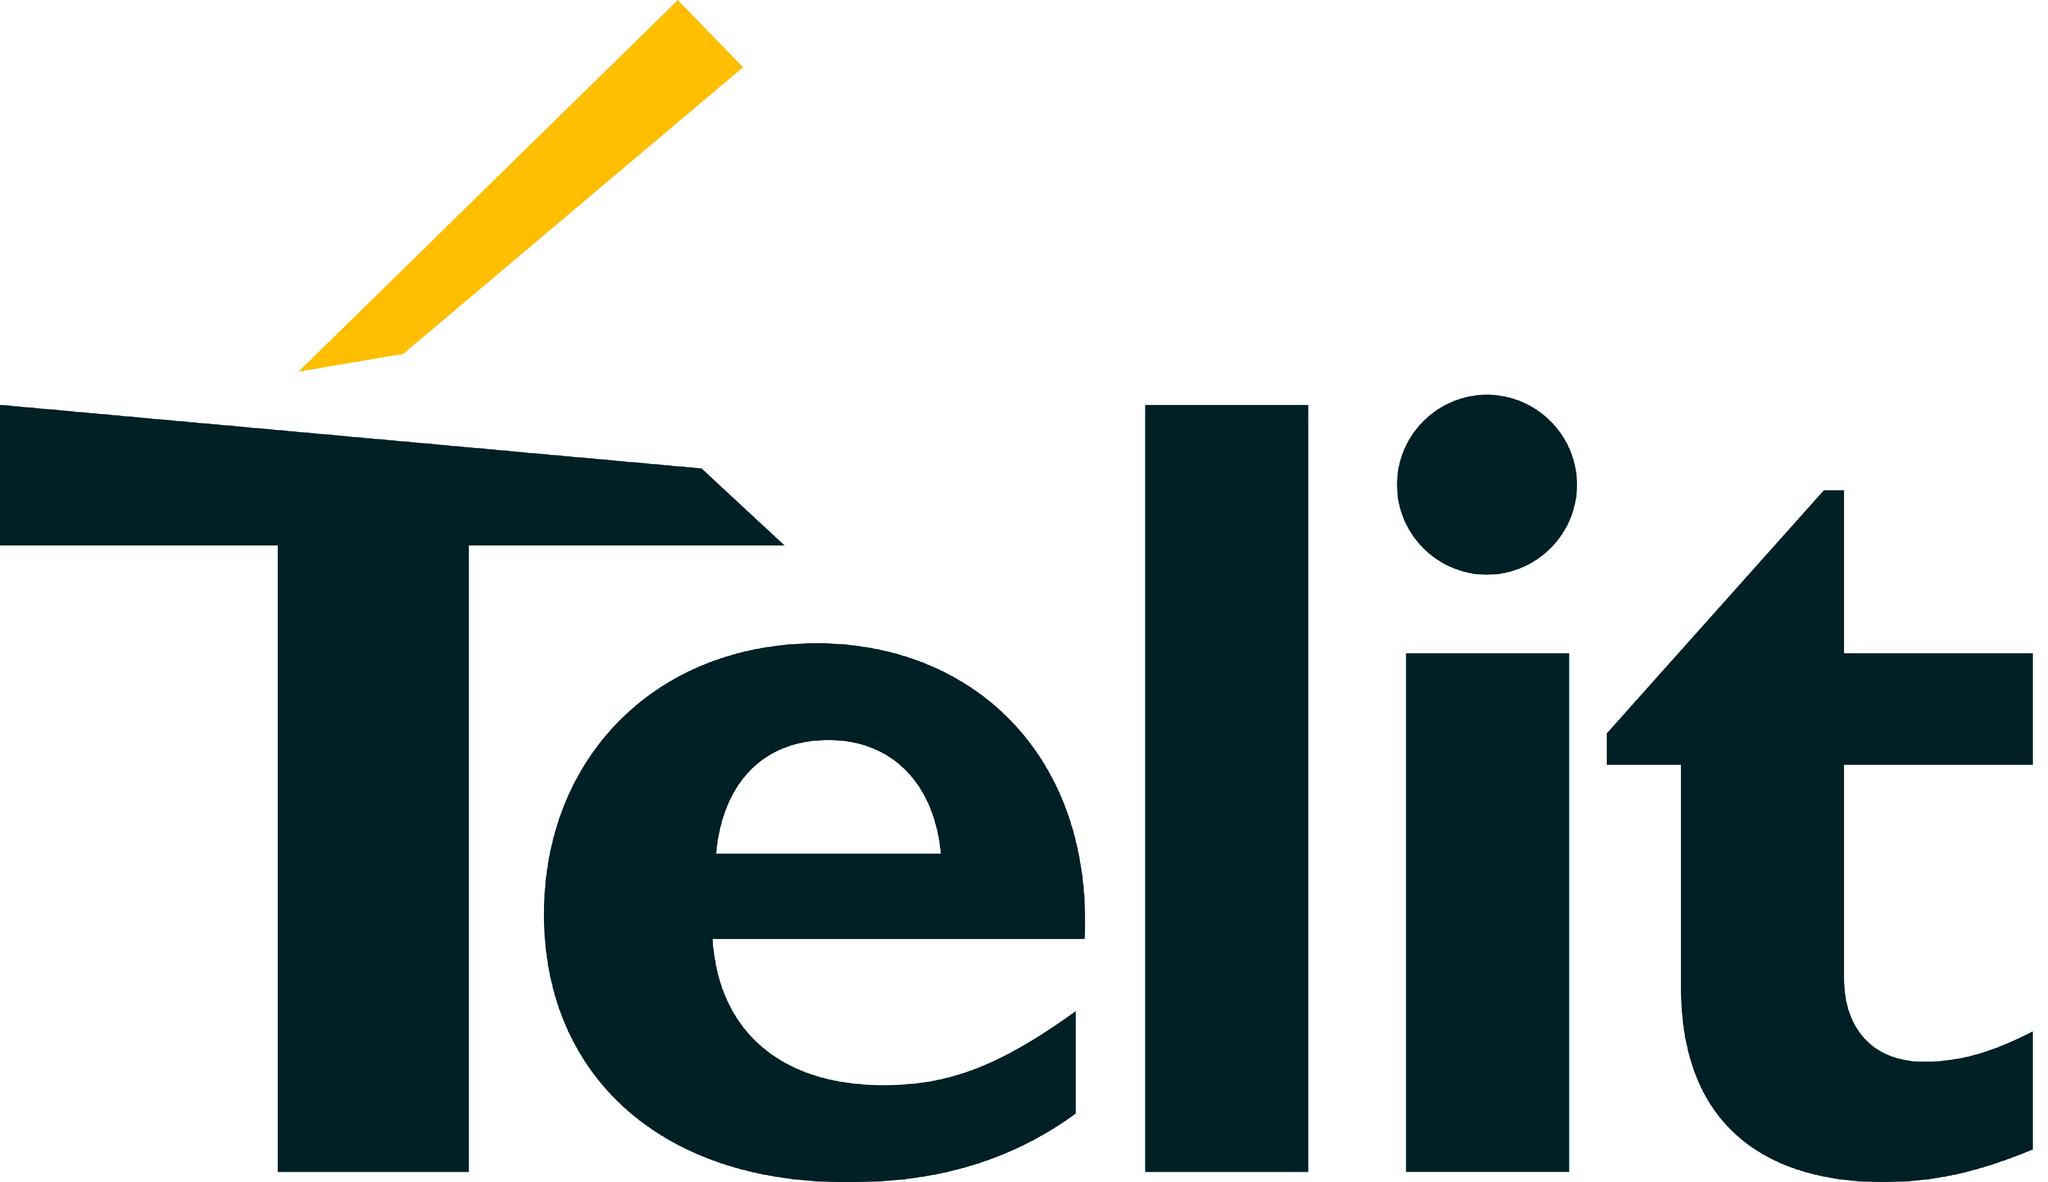 Telit Communications S.p.A